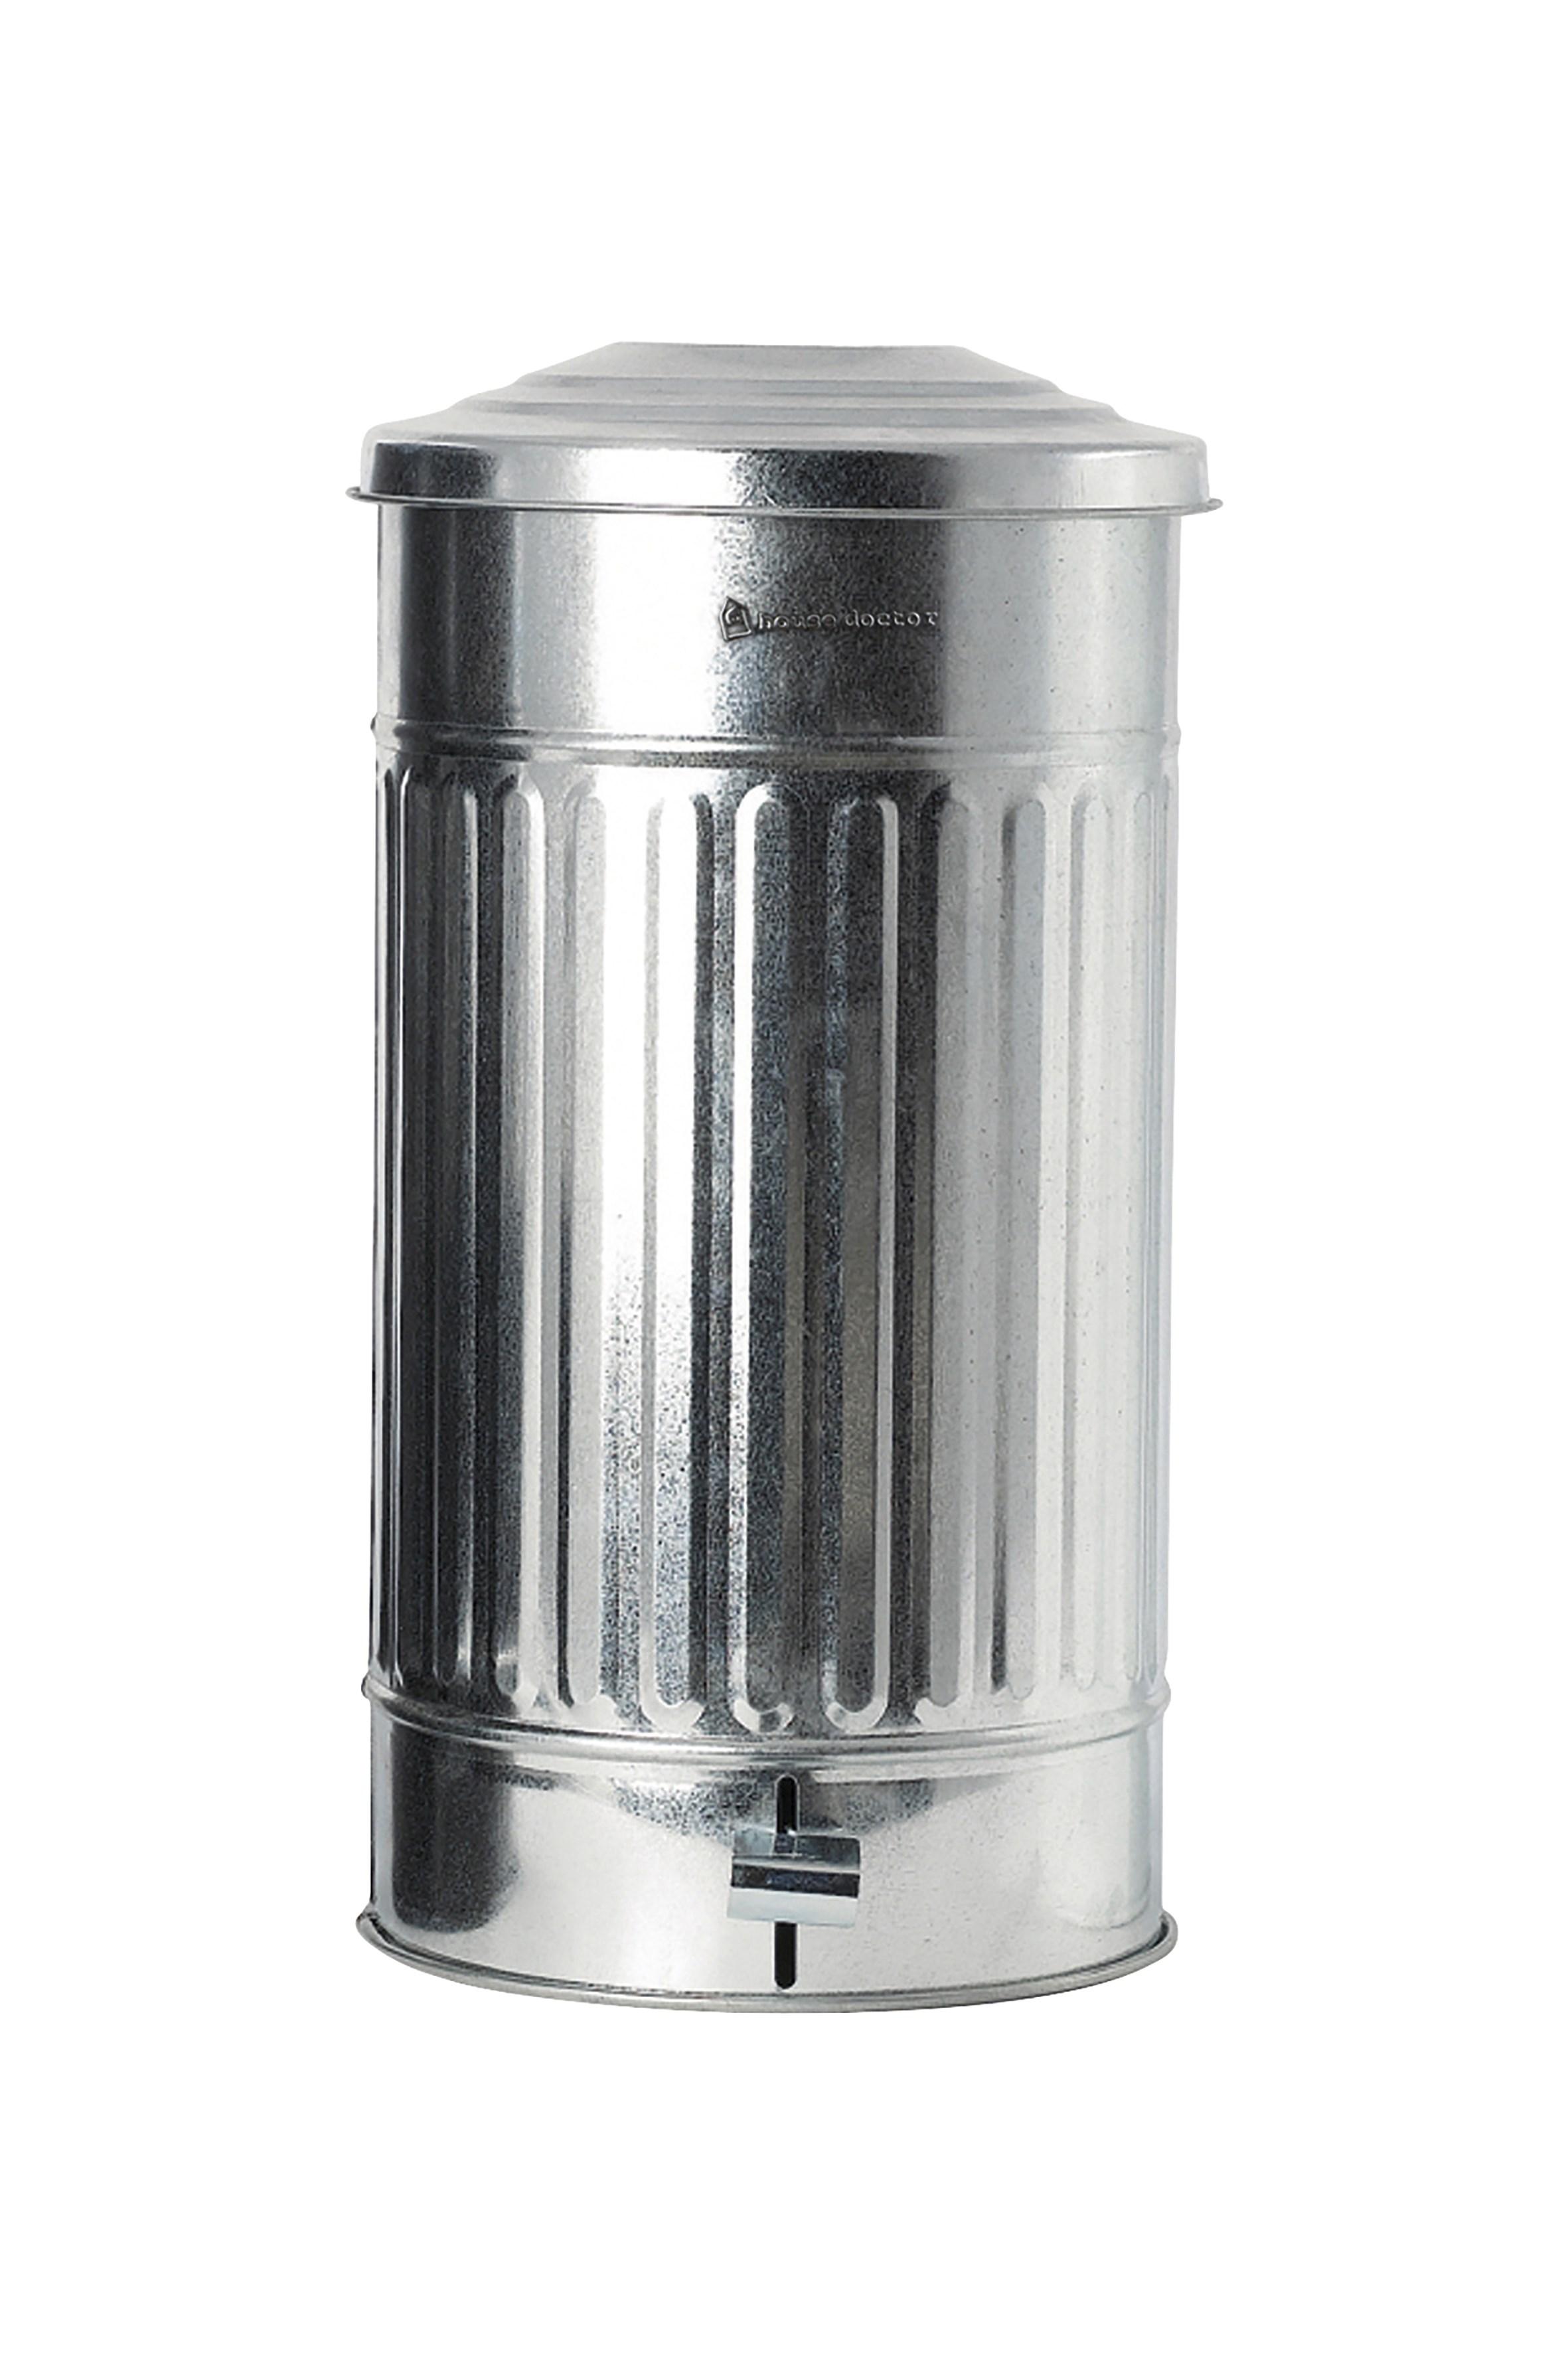 Soptunna Ø 255 cm 24 L – Silver